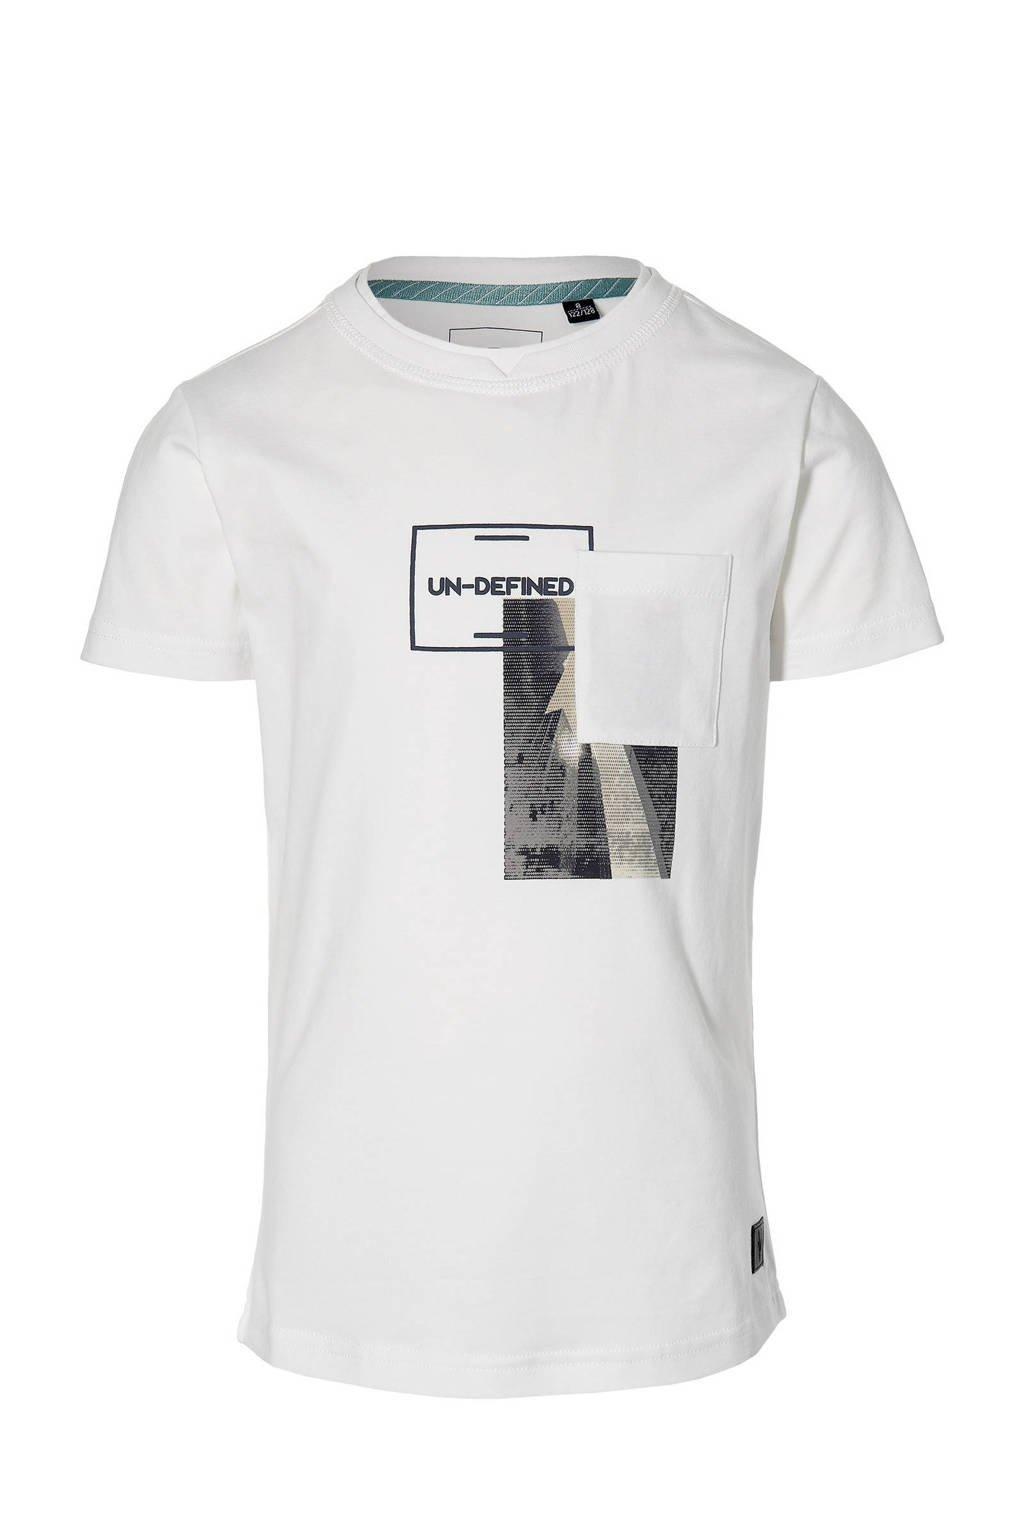 LEVV Boys T-shirt Maes met printopdruk wit, Wit